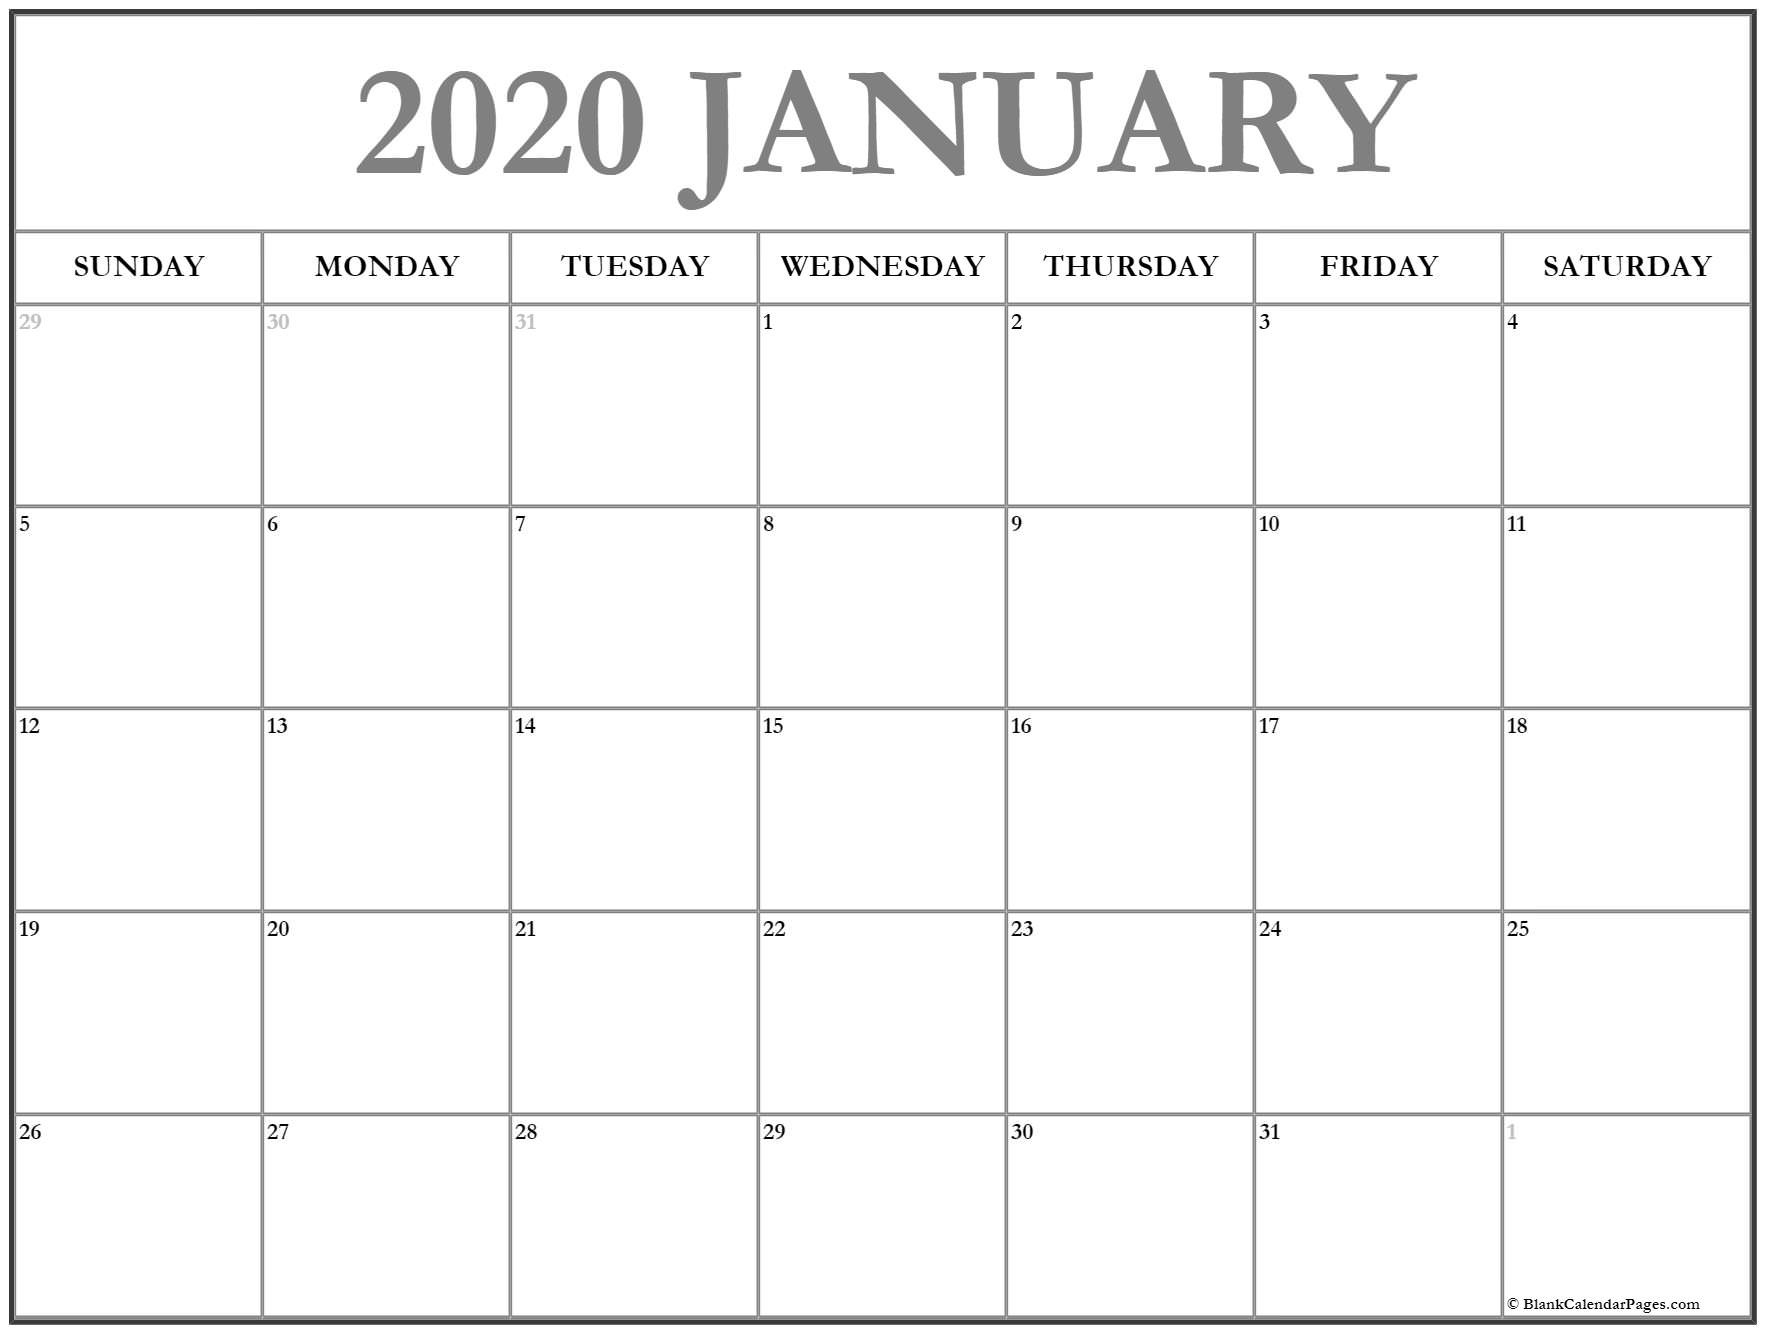 January 2020 Calendar | Free Printable Monthly Calendars-Free January 2020 Calendar